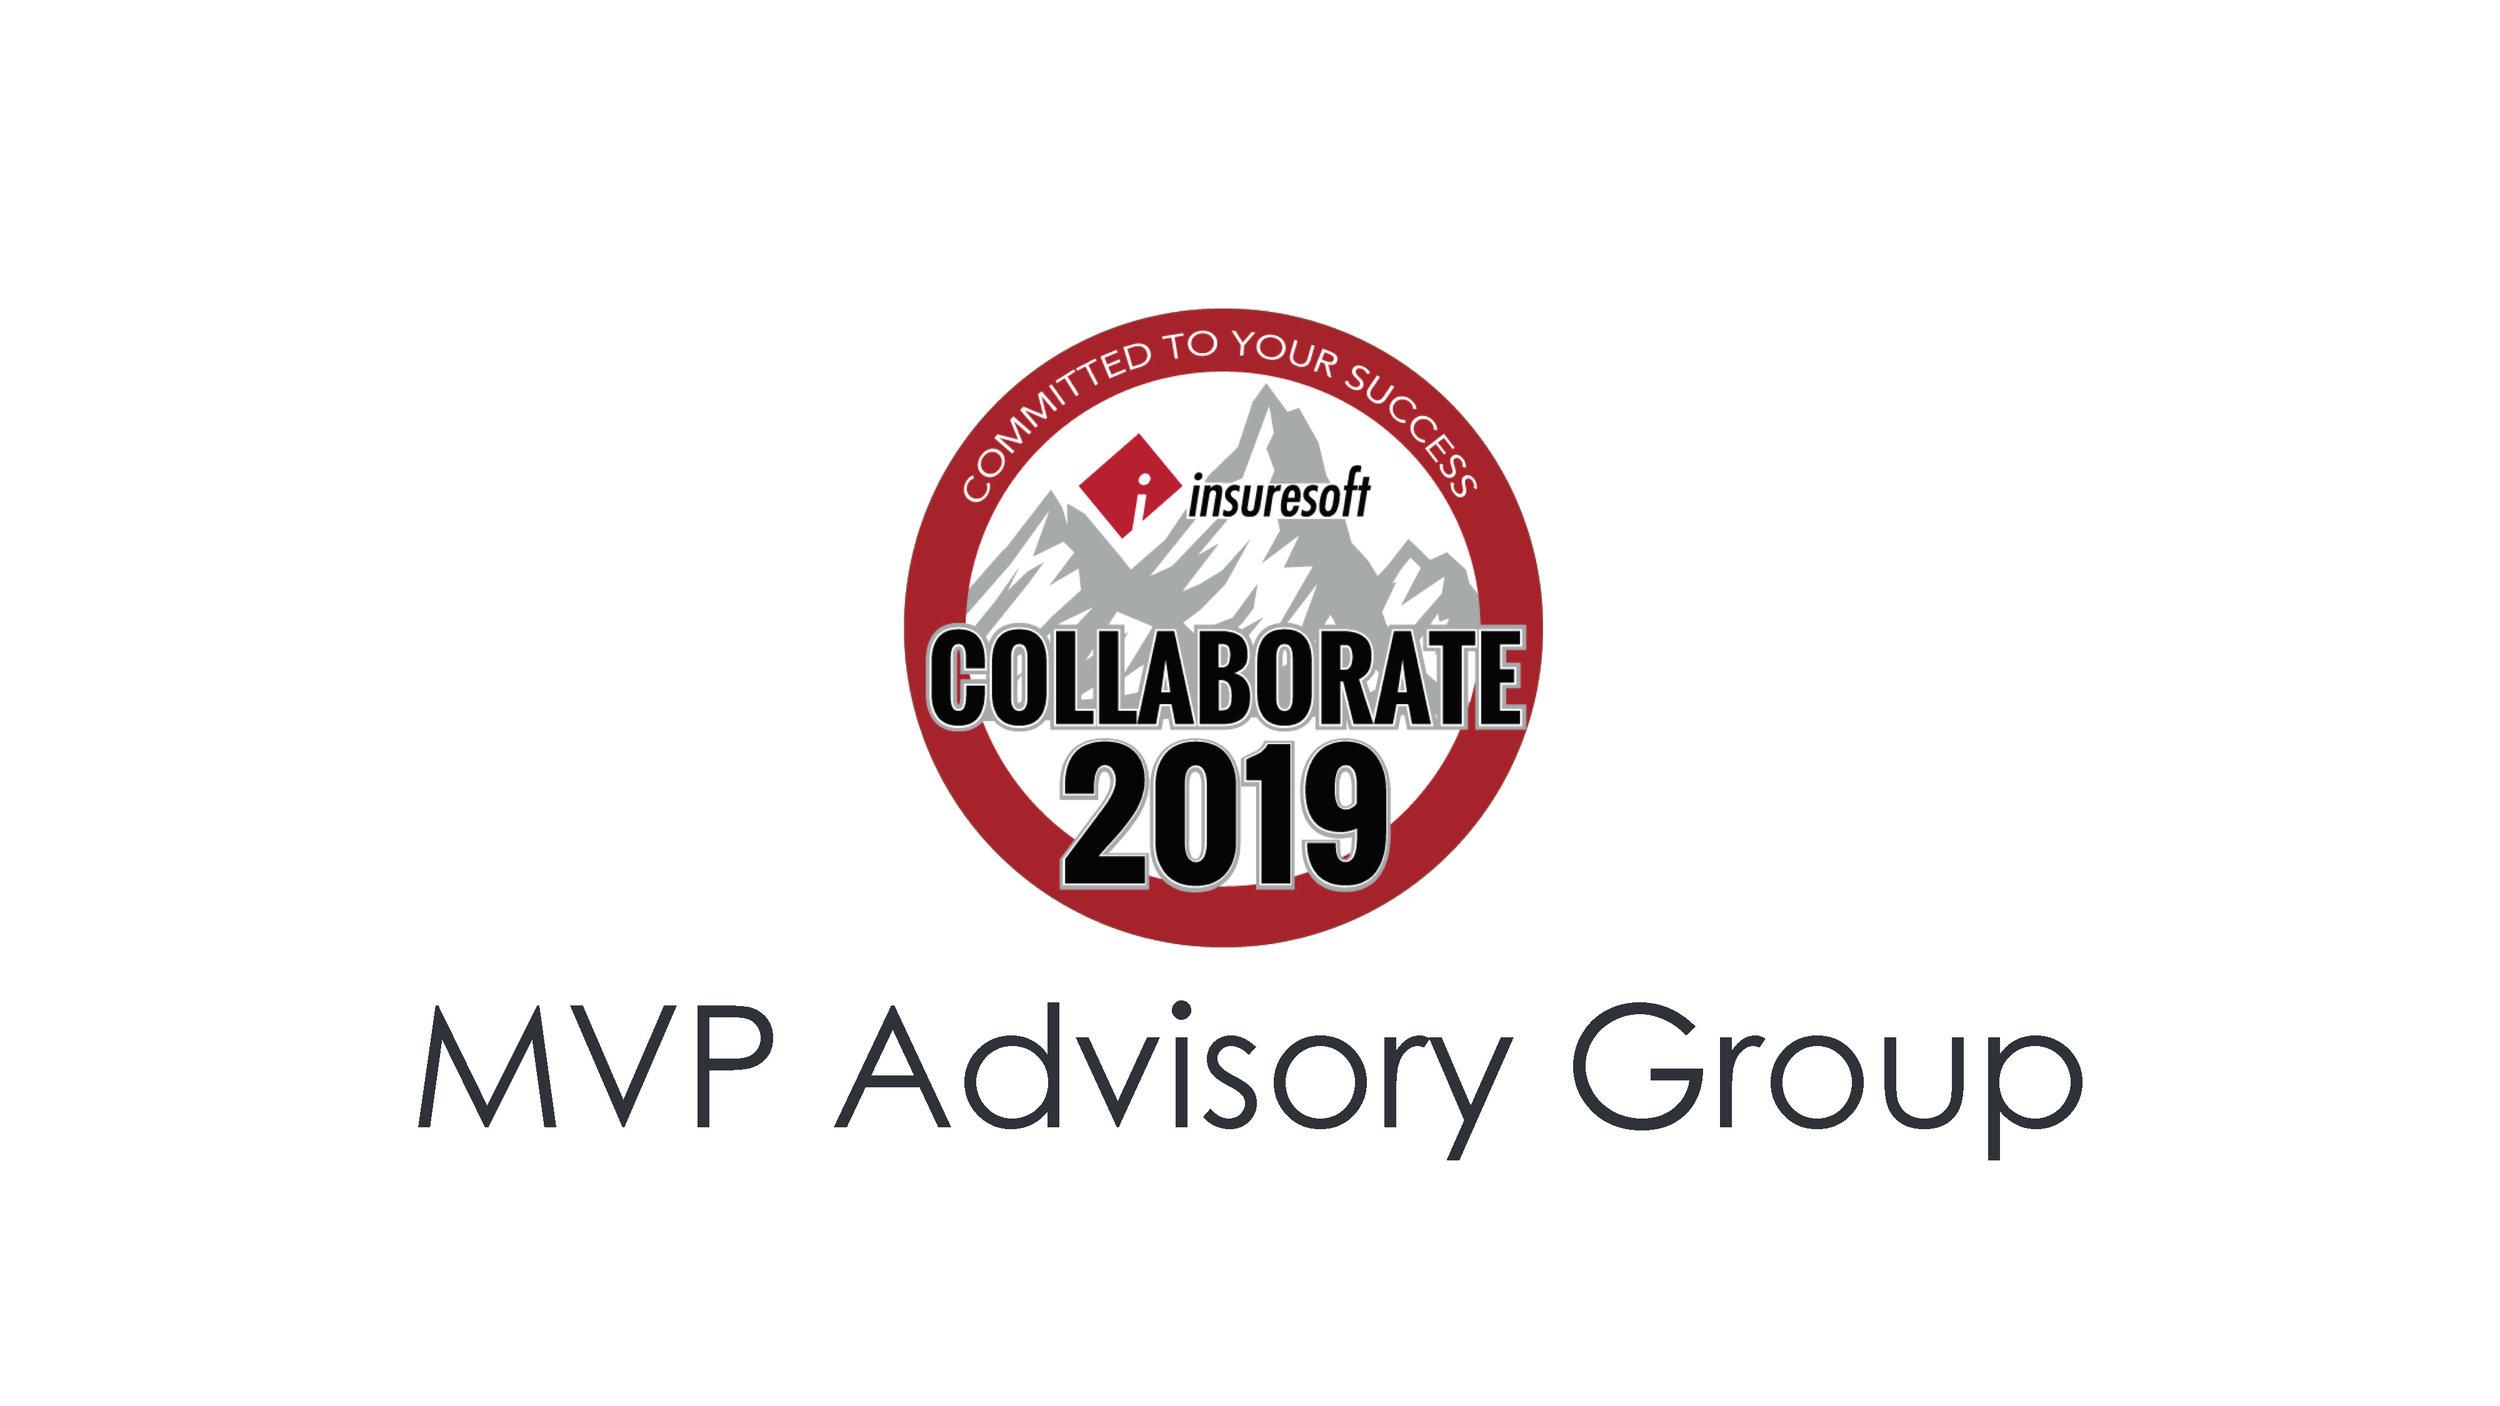 Growth Requires Mature Software Development & Data Strategies  - MVP